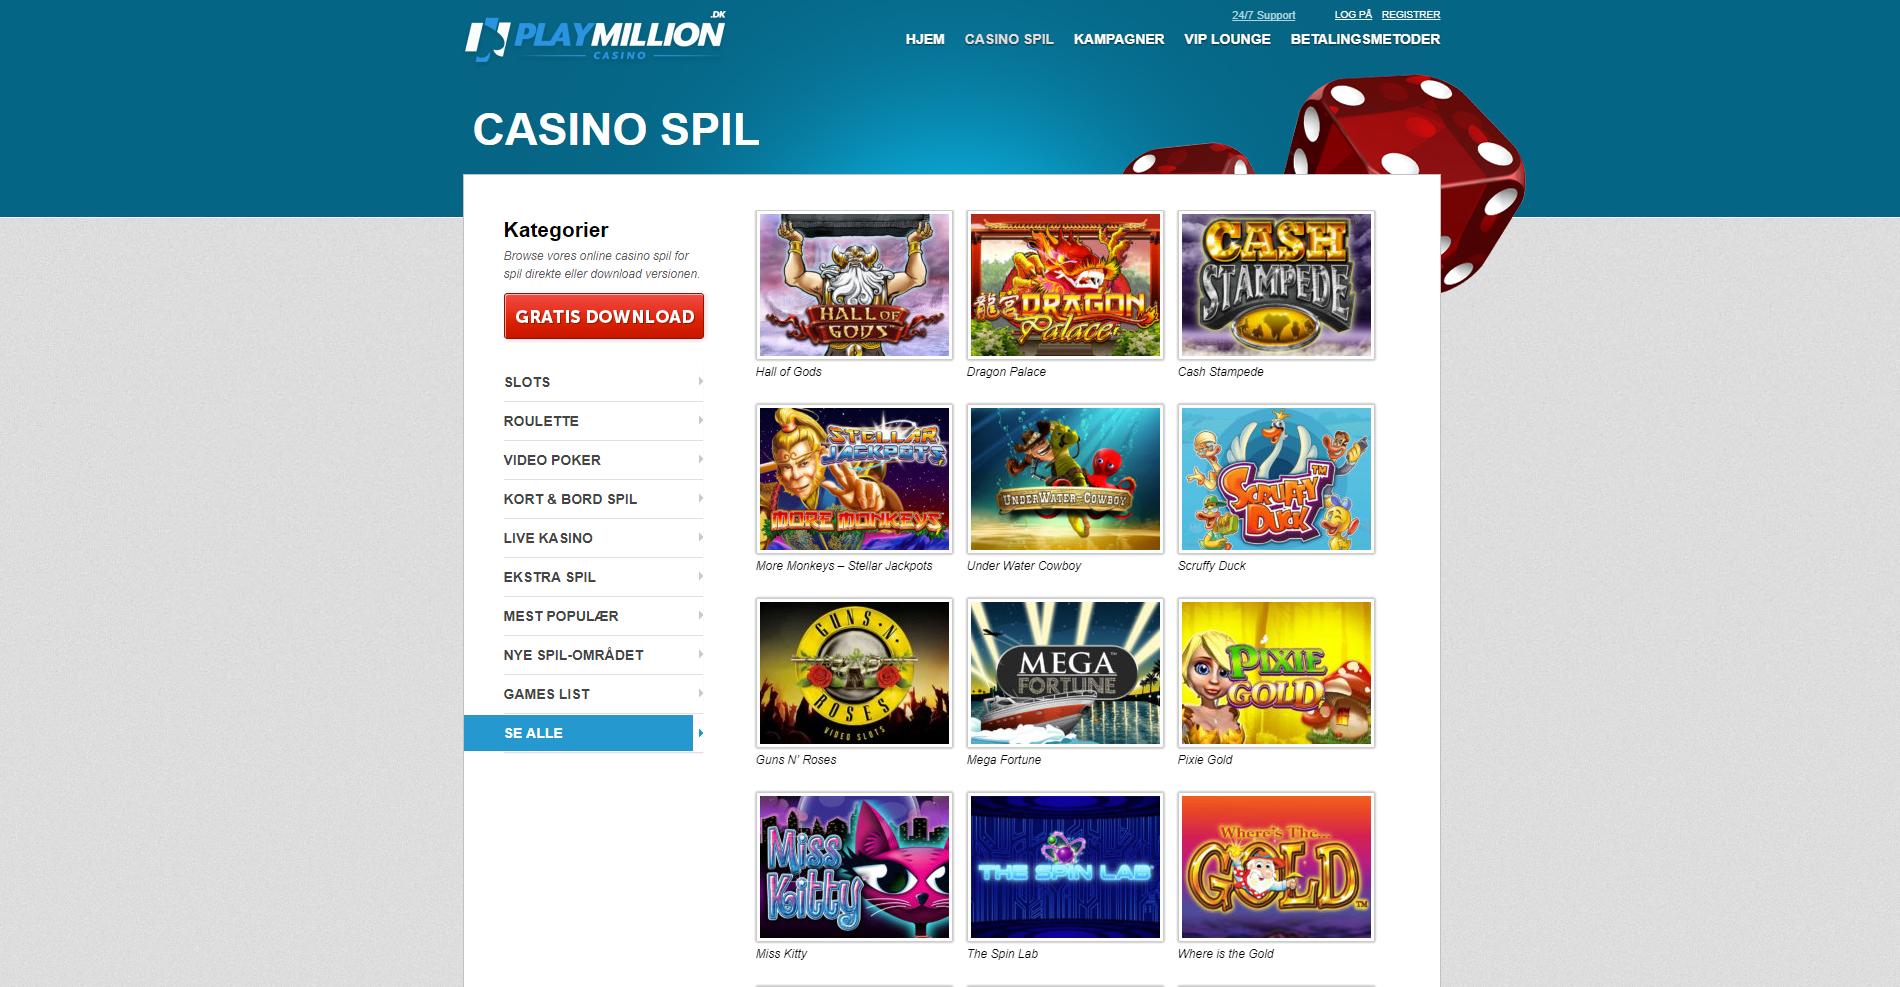 Holland casino online gambling, Online casino no deposit